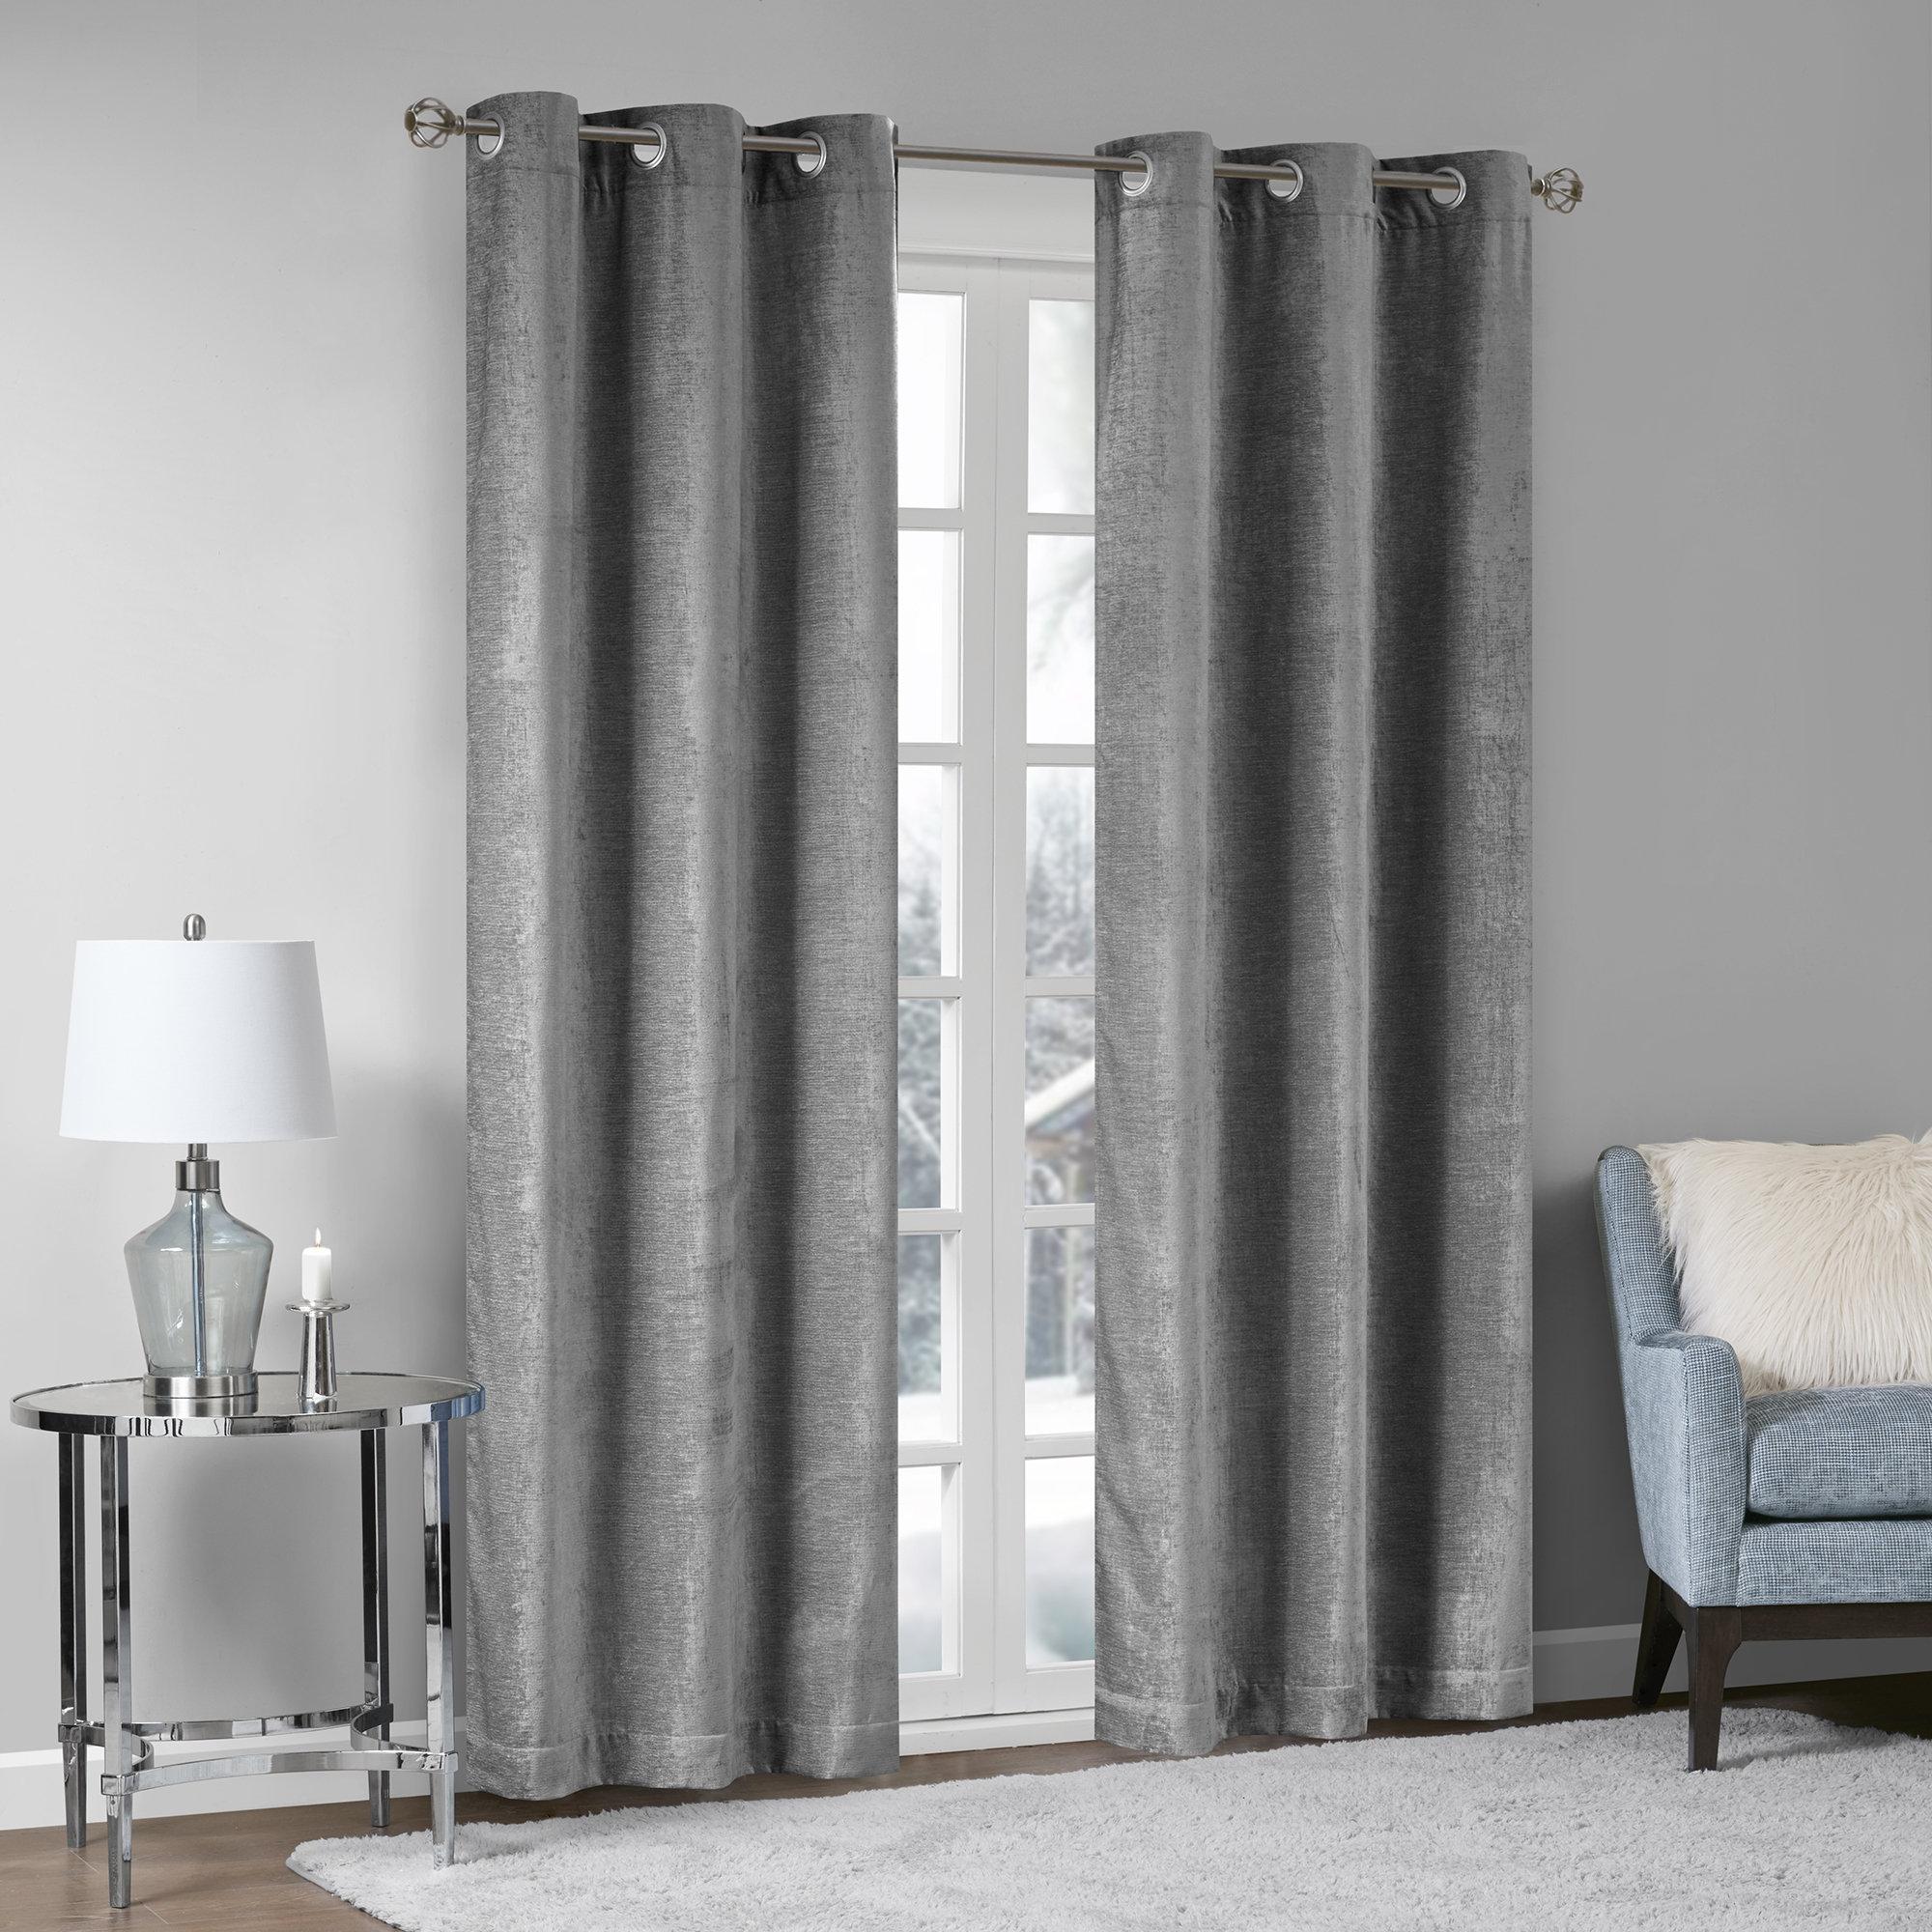 Modern Eyelet Curtain For Living Room Bedroom Laser Cut Window Treatment